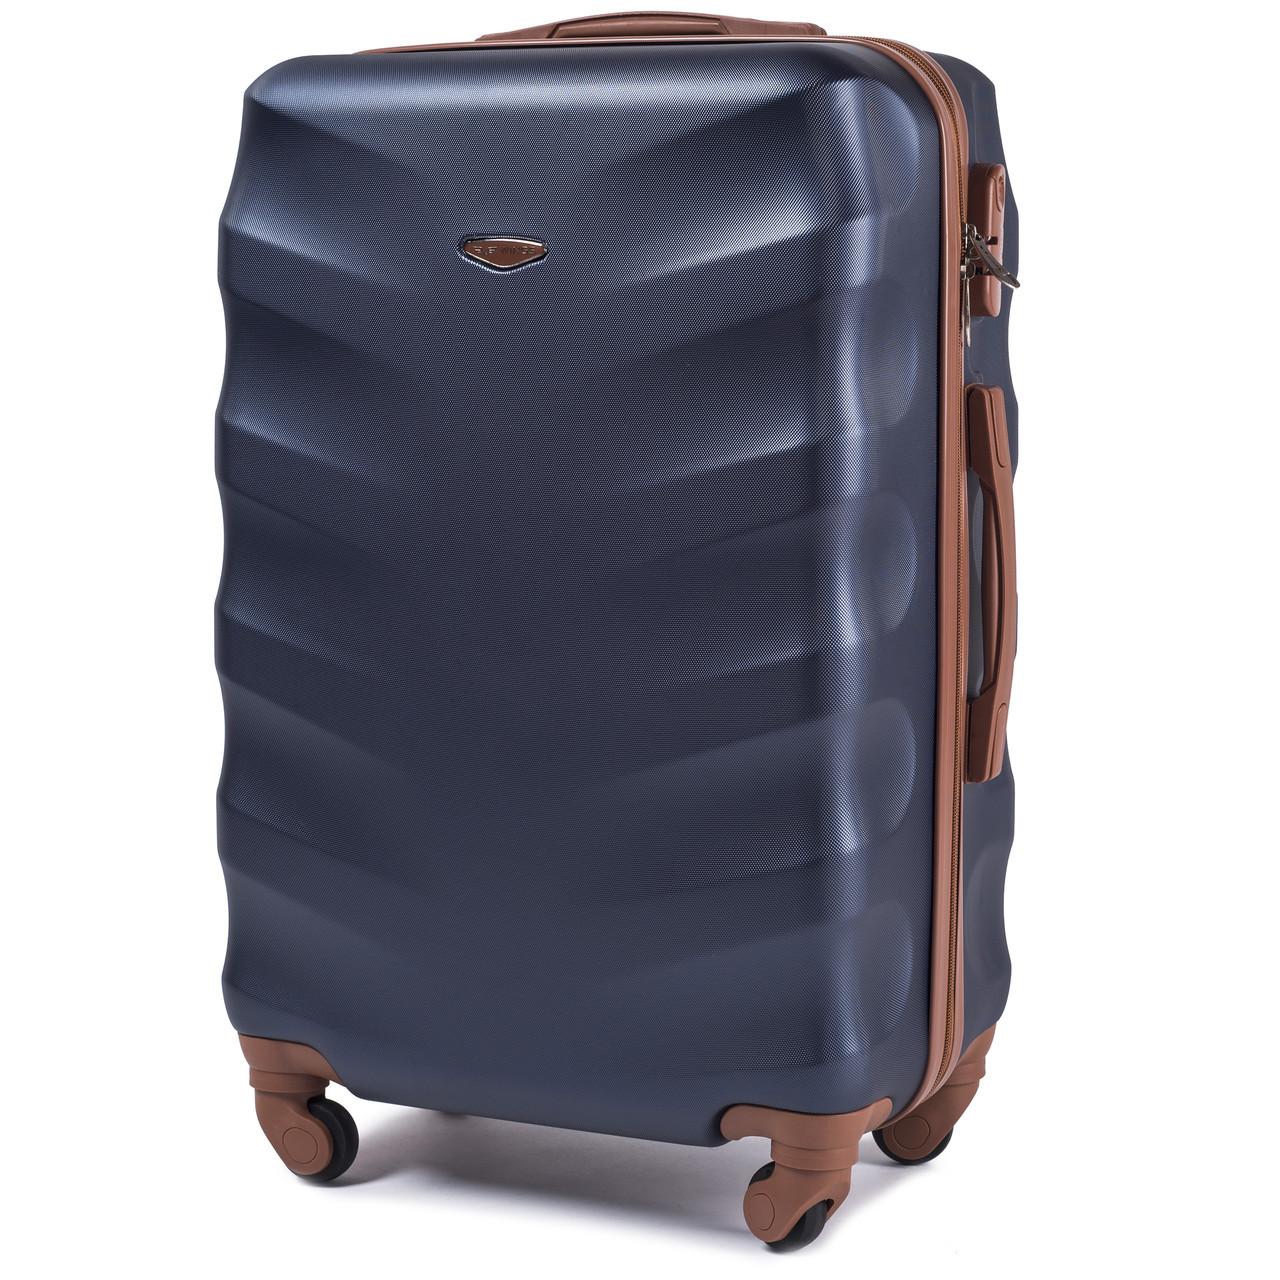 f4074790c401 Чемодан Wings 406 Средний (M) Exclusive Синий - LOST BAG - сумки, чемоданы